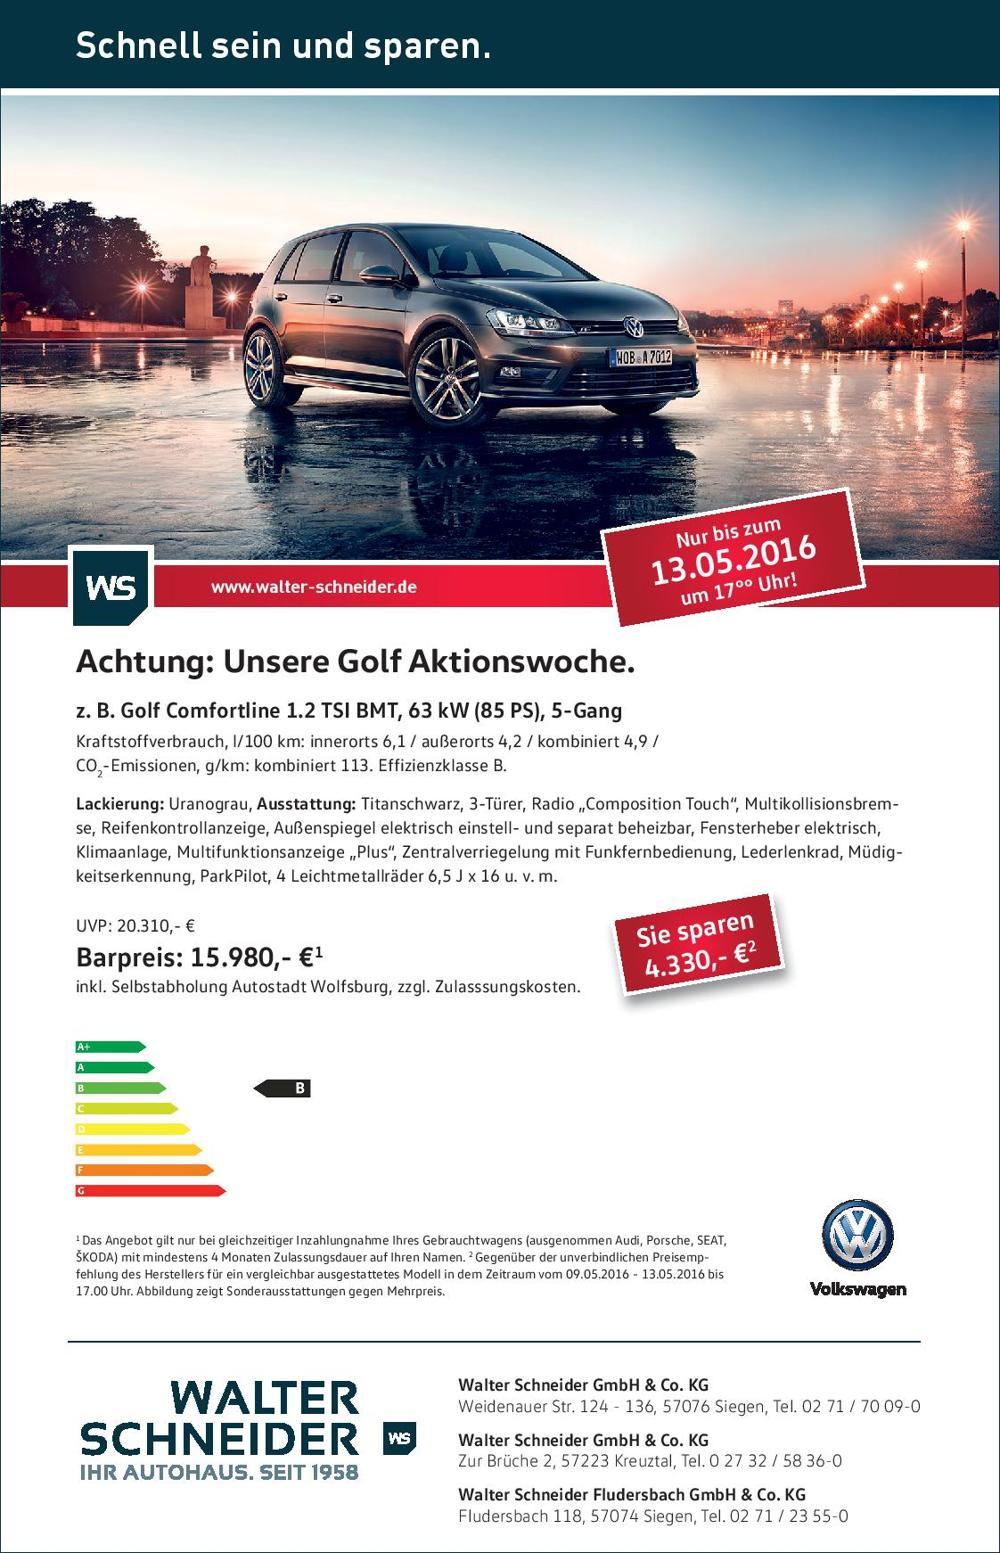 2016-05-09 Golf Aktionswoche_VW Schneider_01